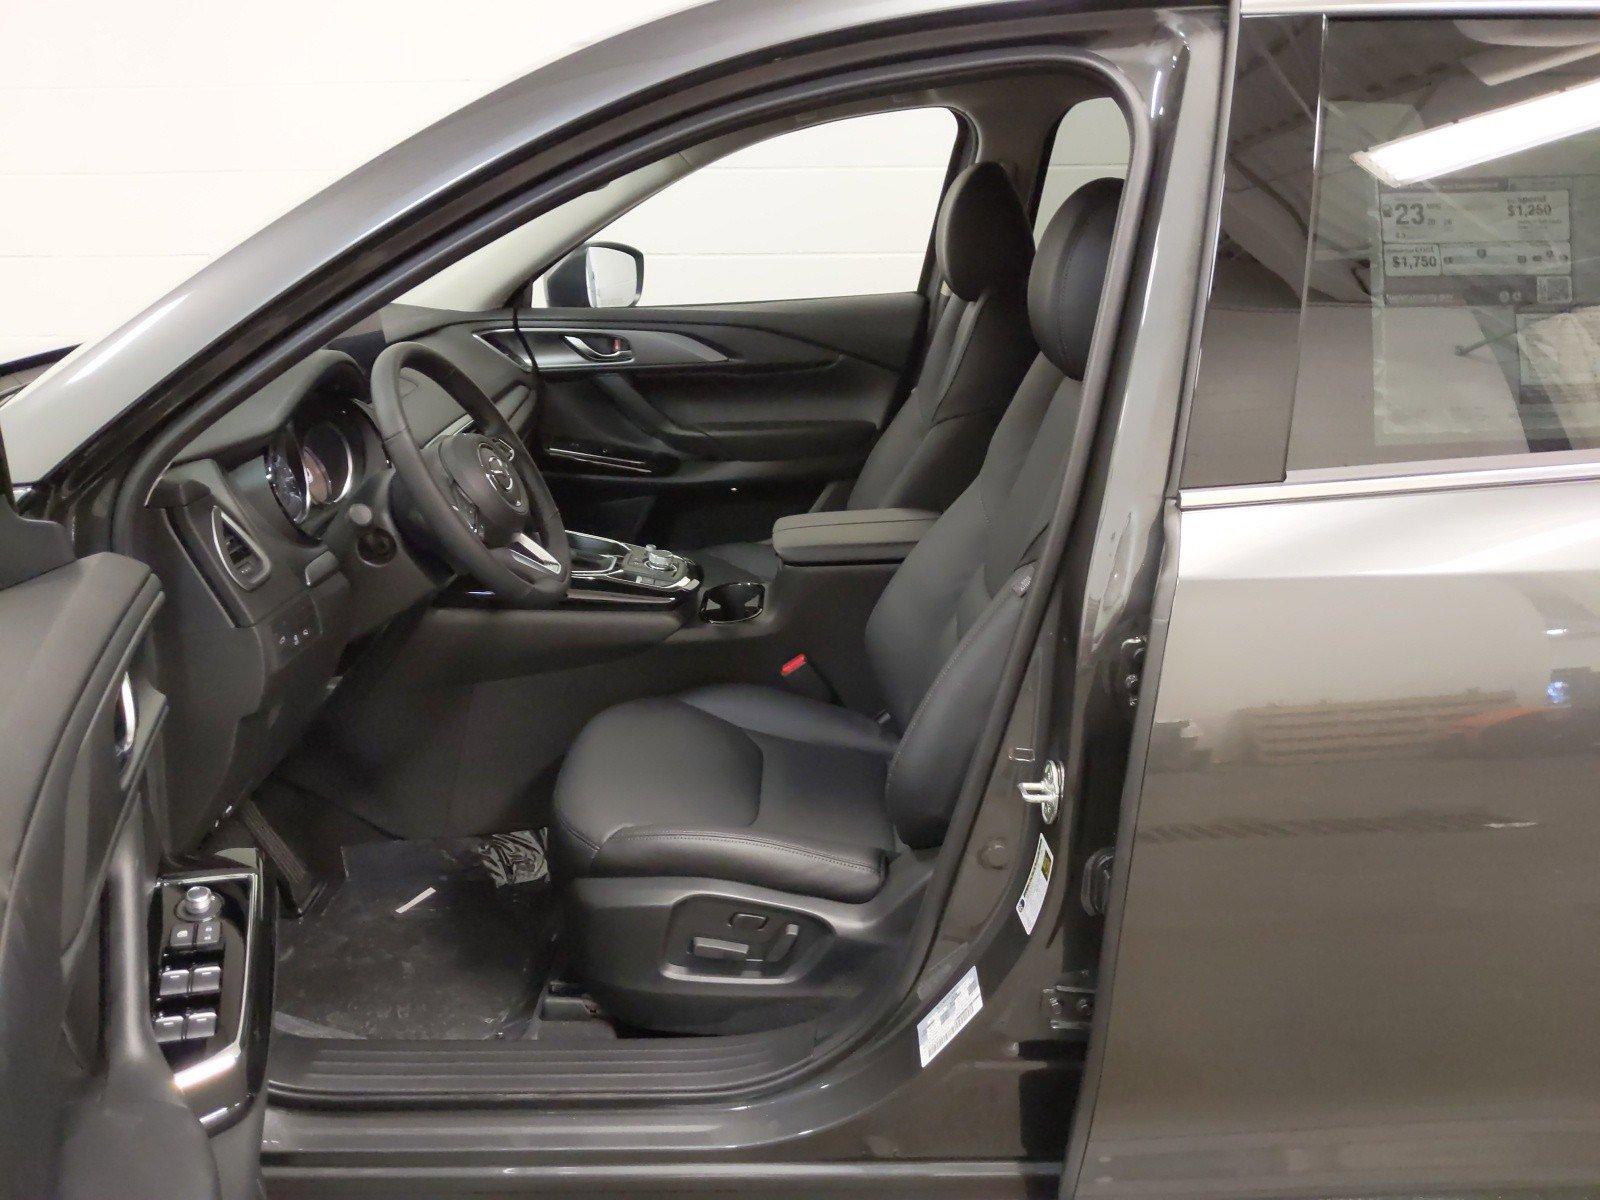 New 2020 Mazda CX-9 Touring Sport Utility for sale in Lincoln NE